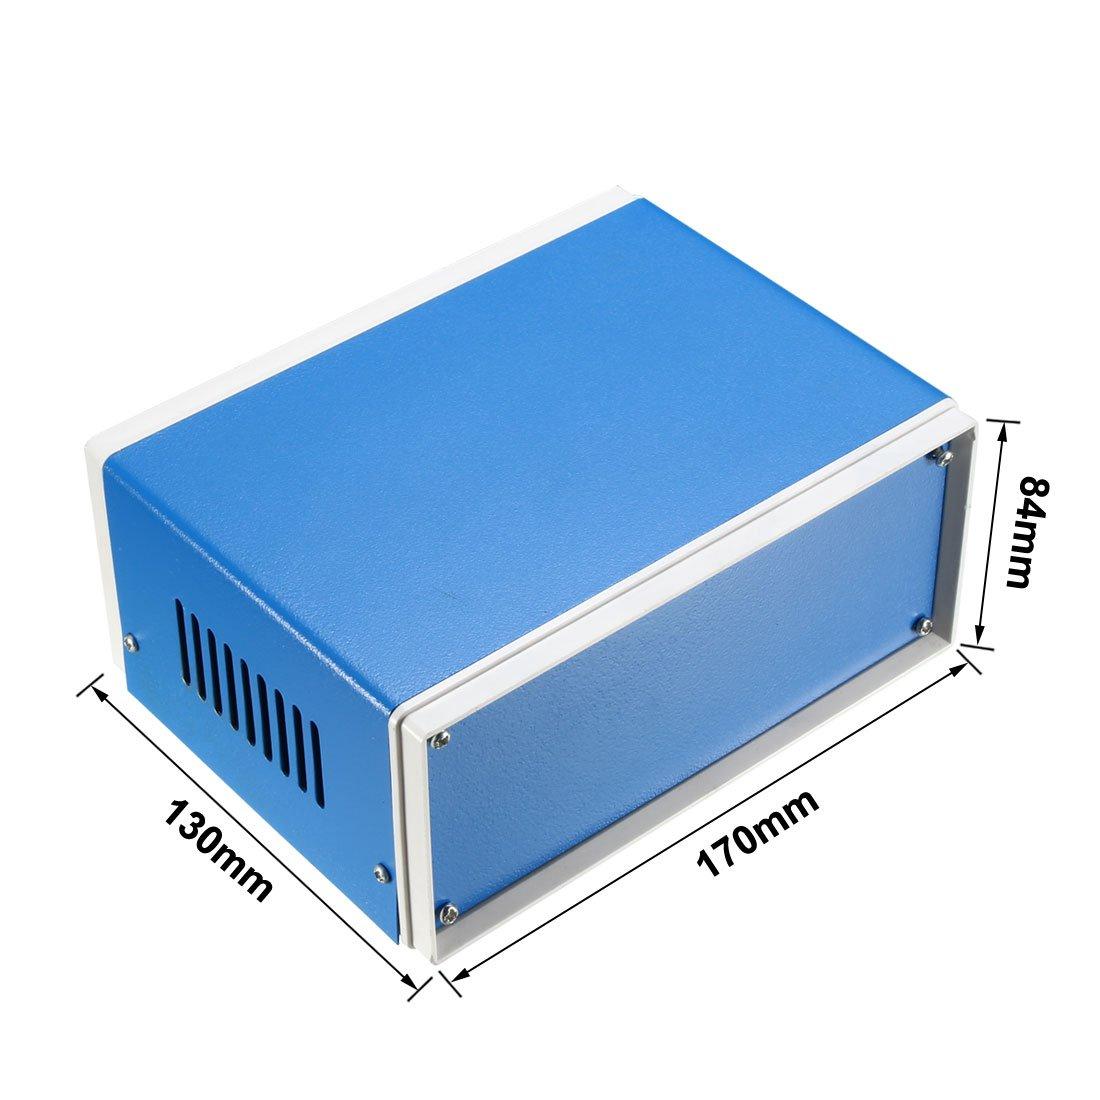 sourcingmap Metal Blue Project Junction Box Enclosure Case 200 x 165 x 90mm//7.87 x 6.5 x 3.54inch